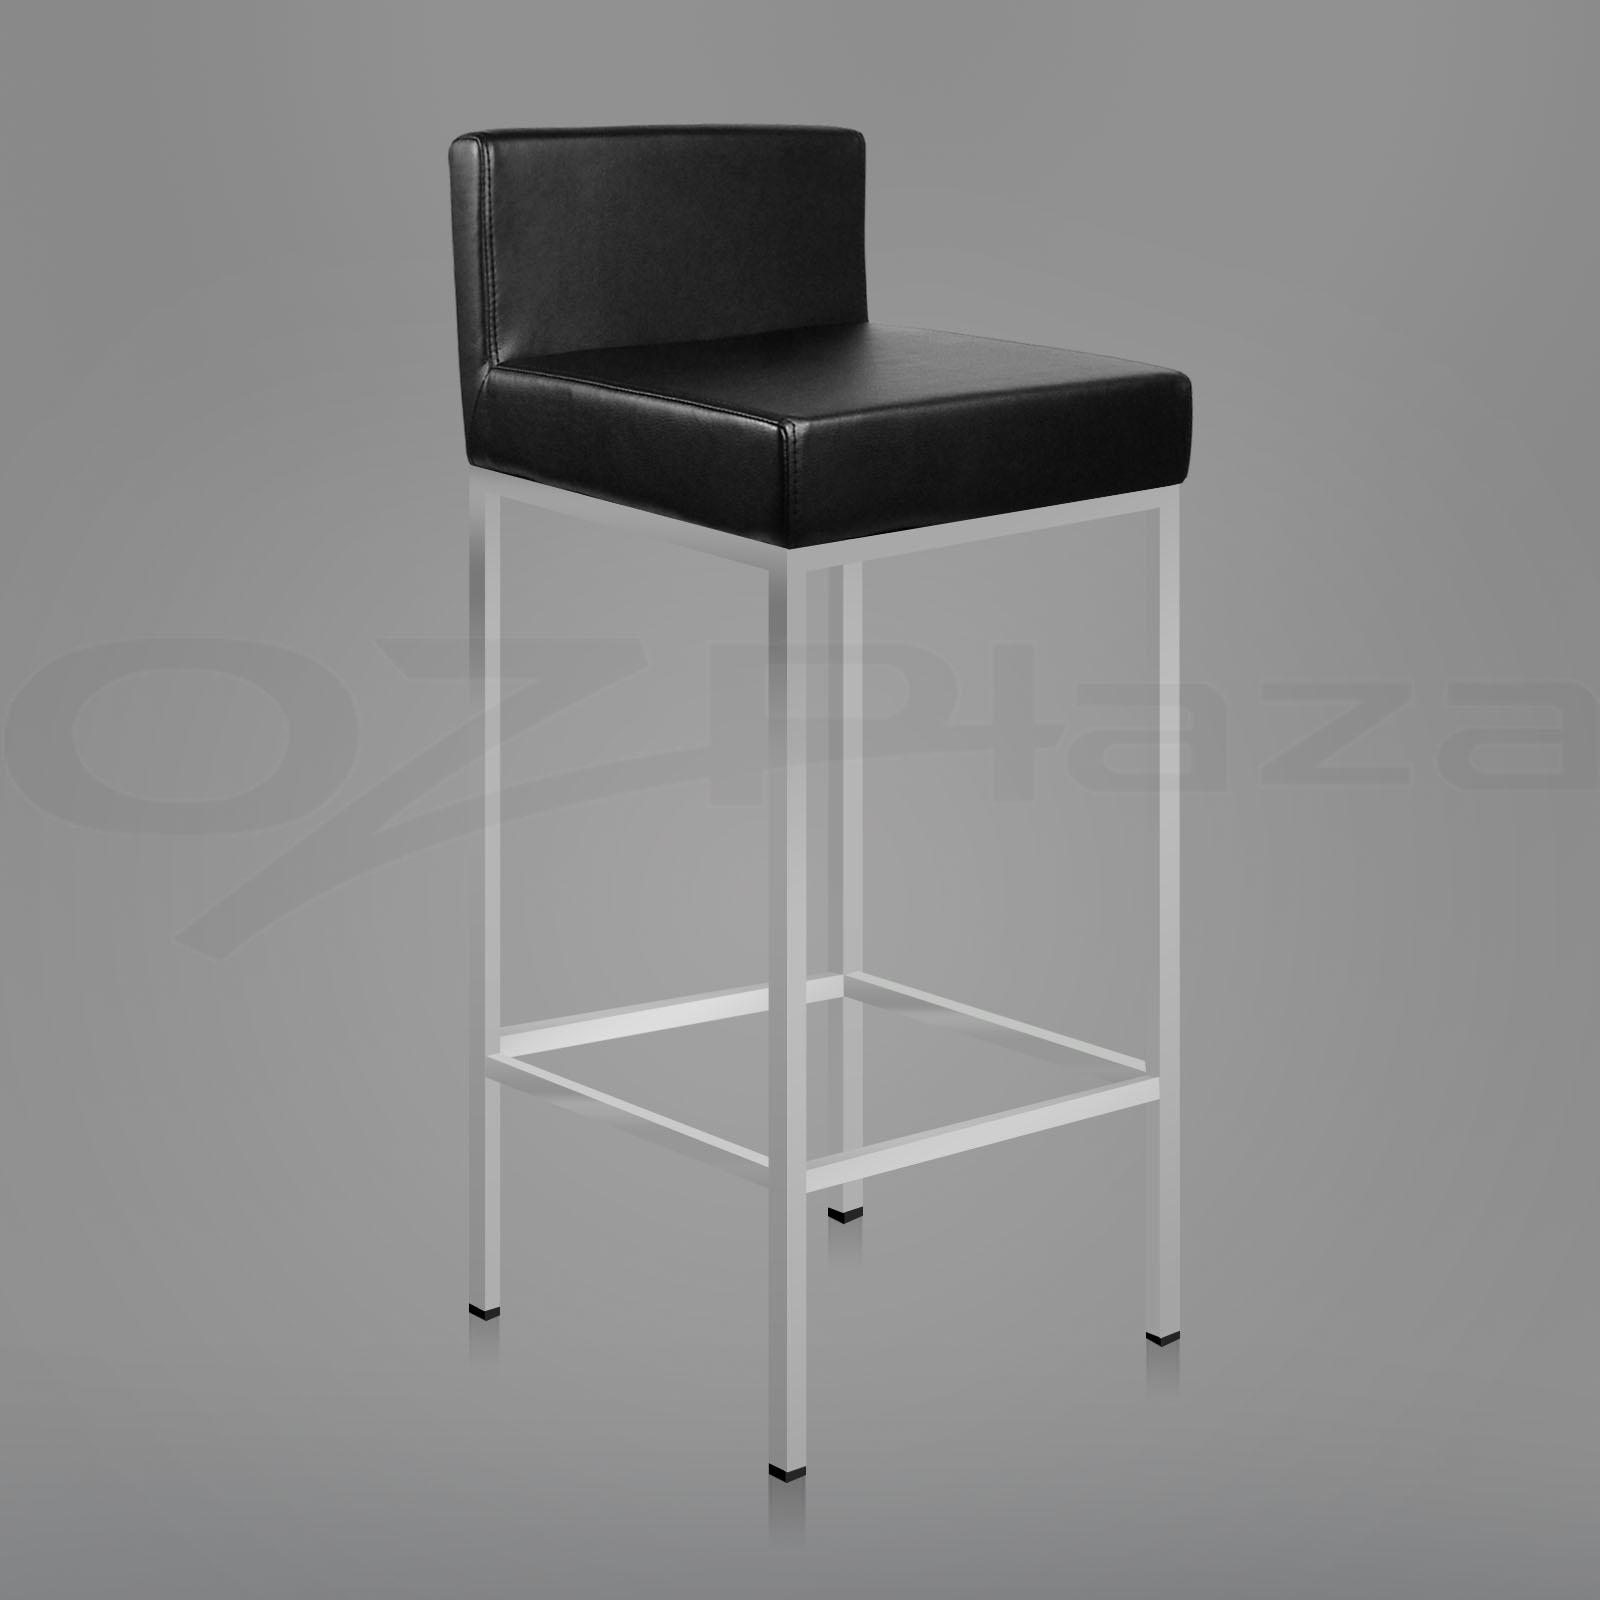 bar stool chair legs zero gravity cup holder 2x pu leather modern kitchen barstool